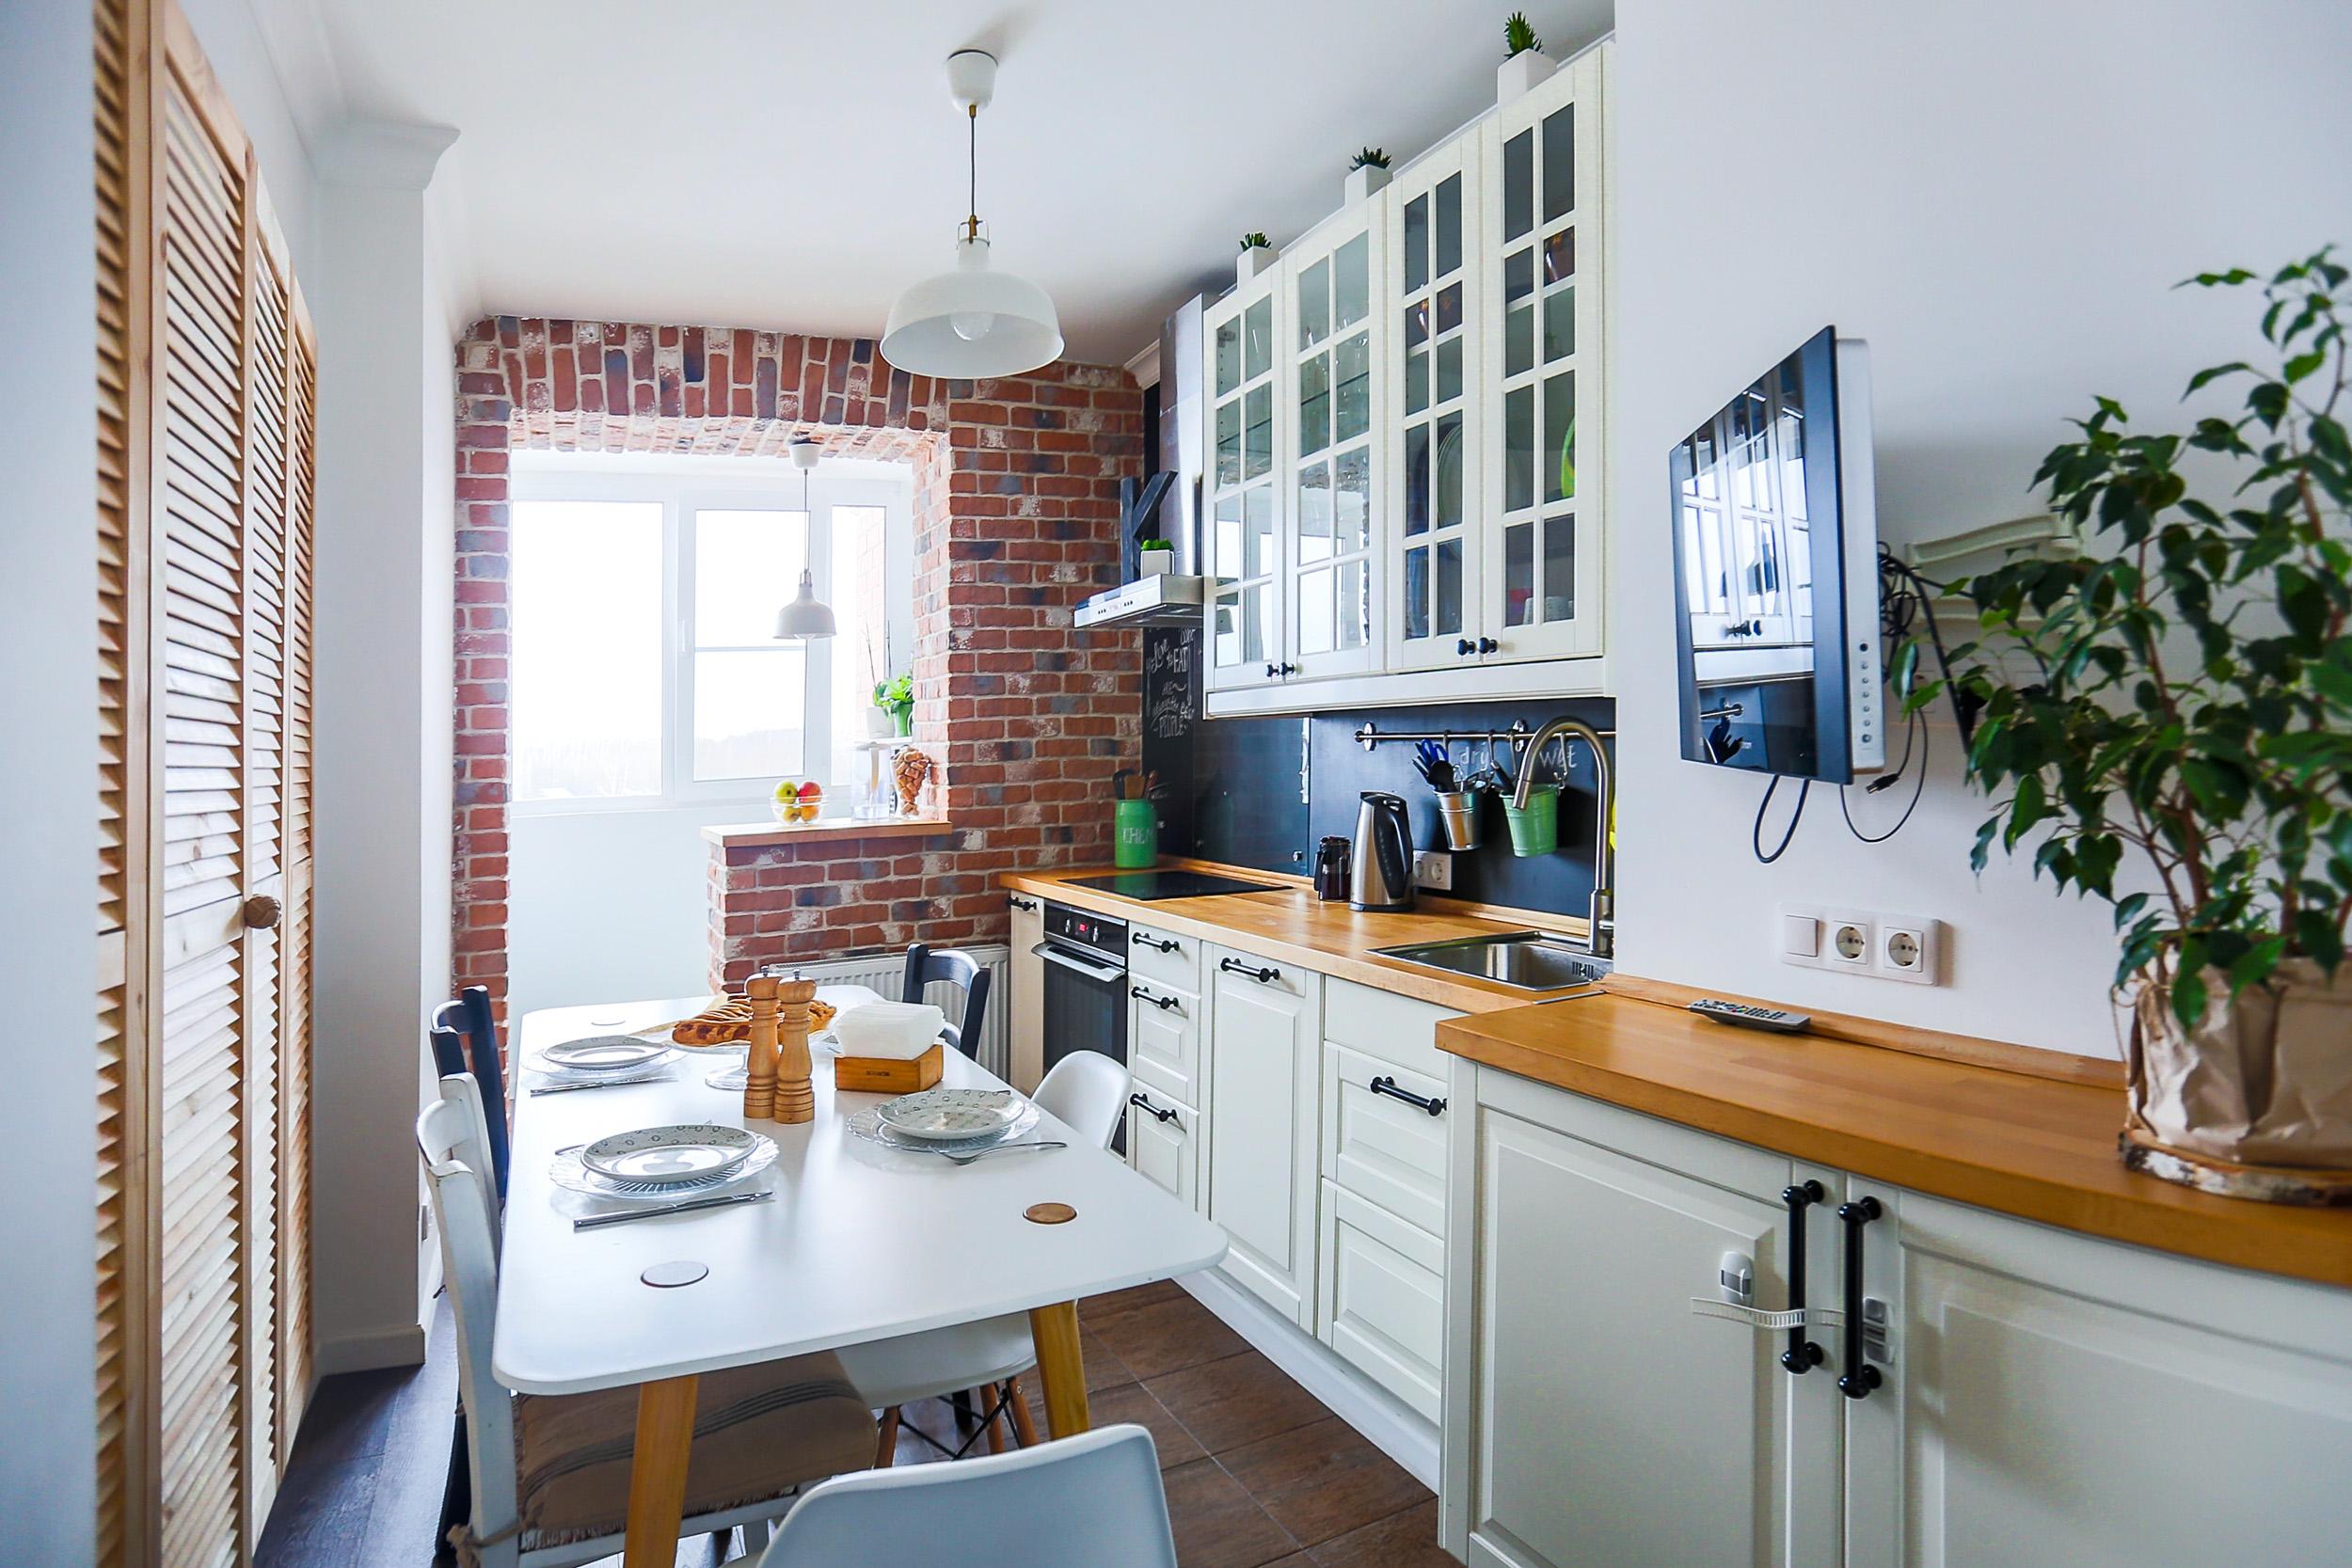 Холодильник под окном на кухне